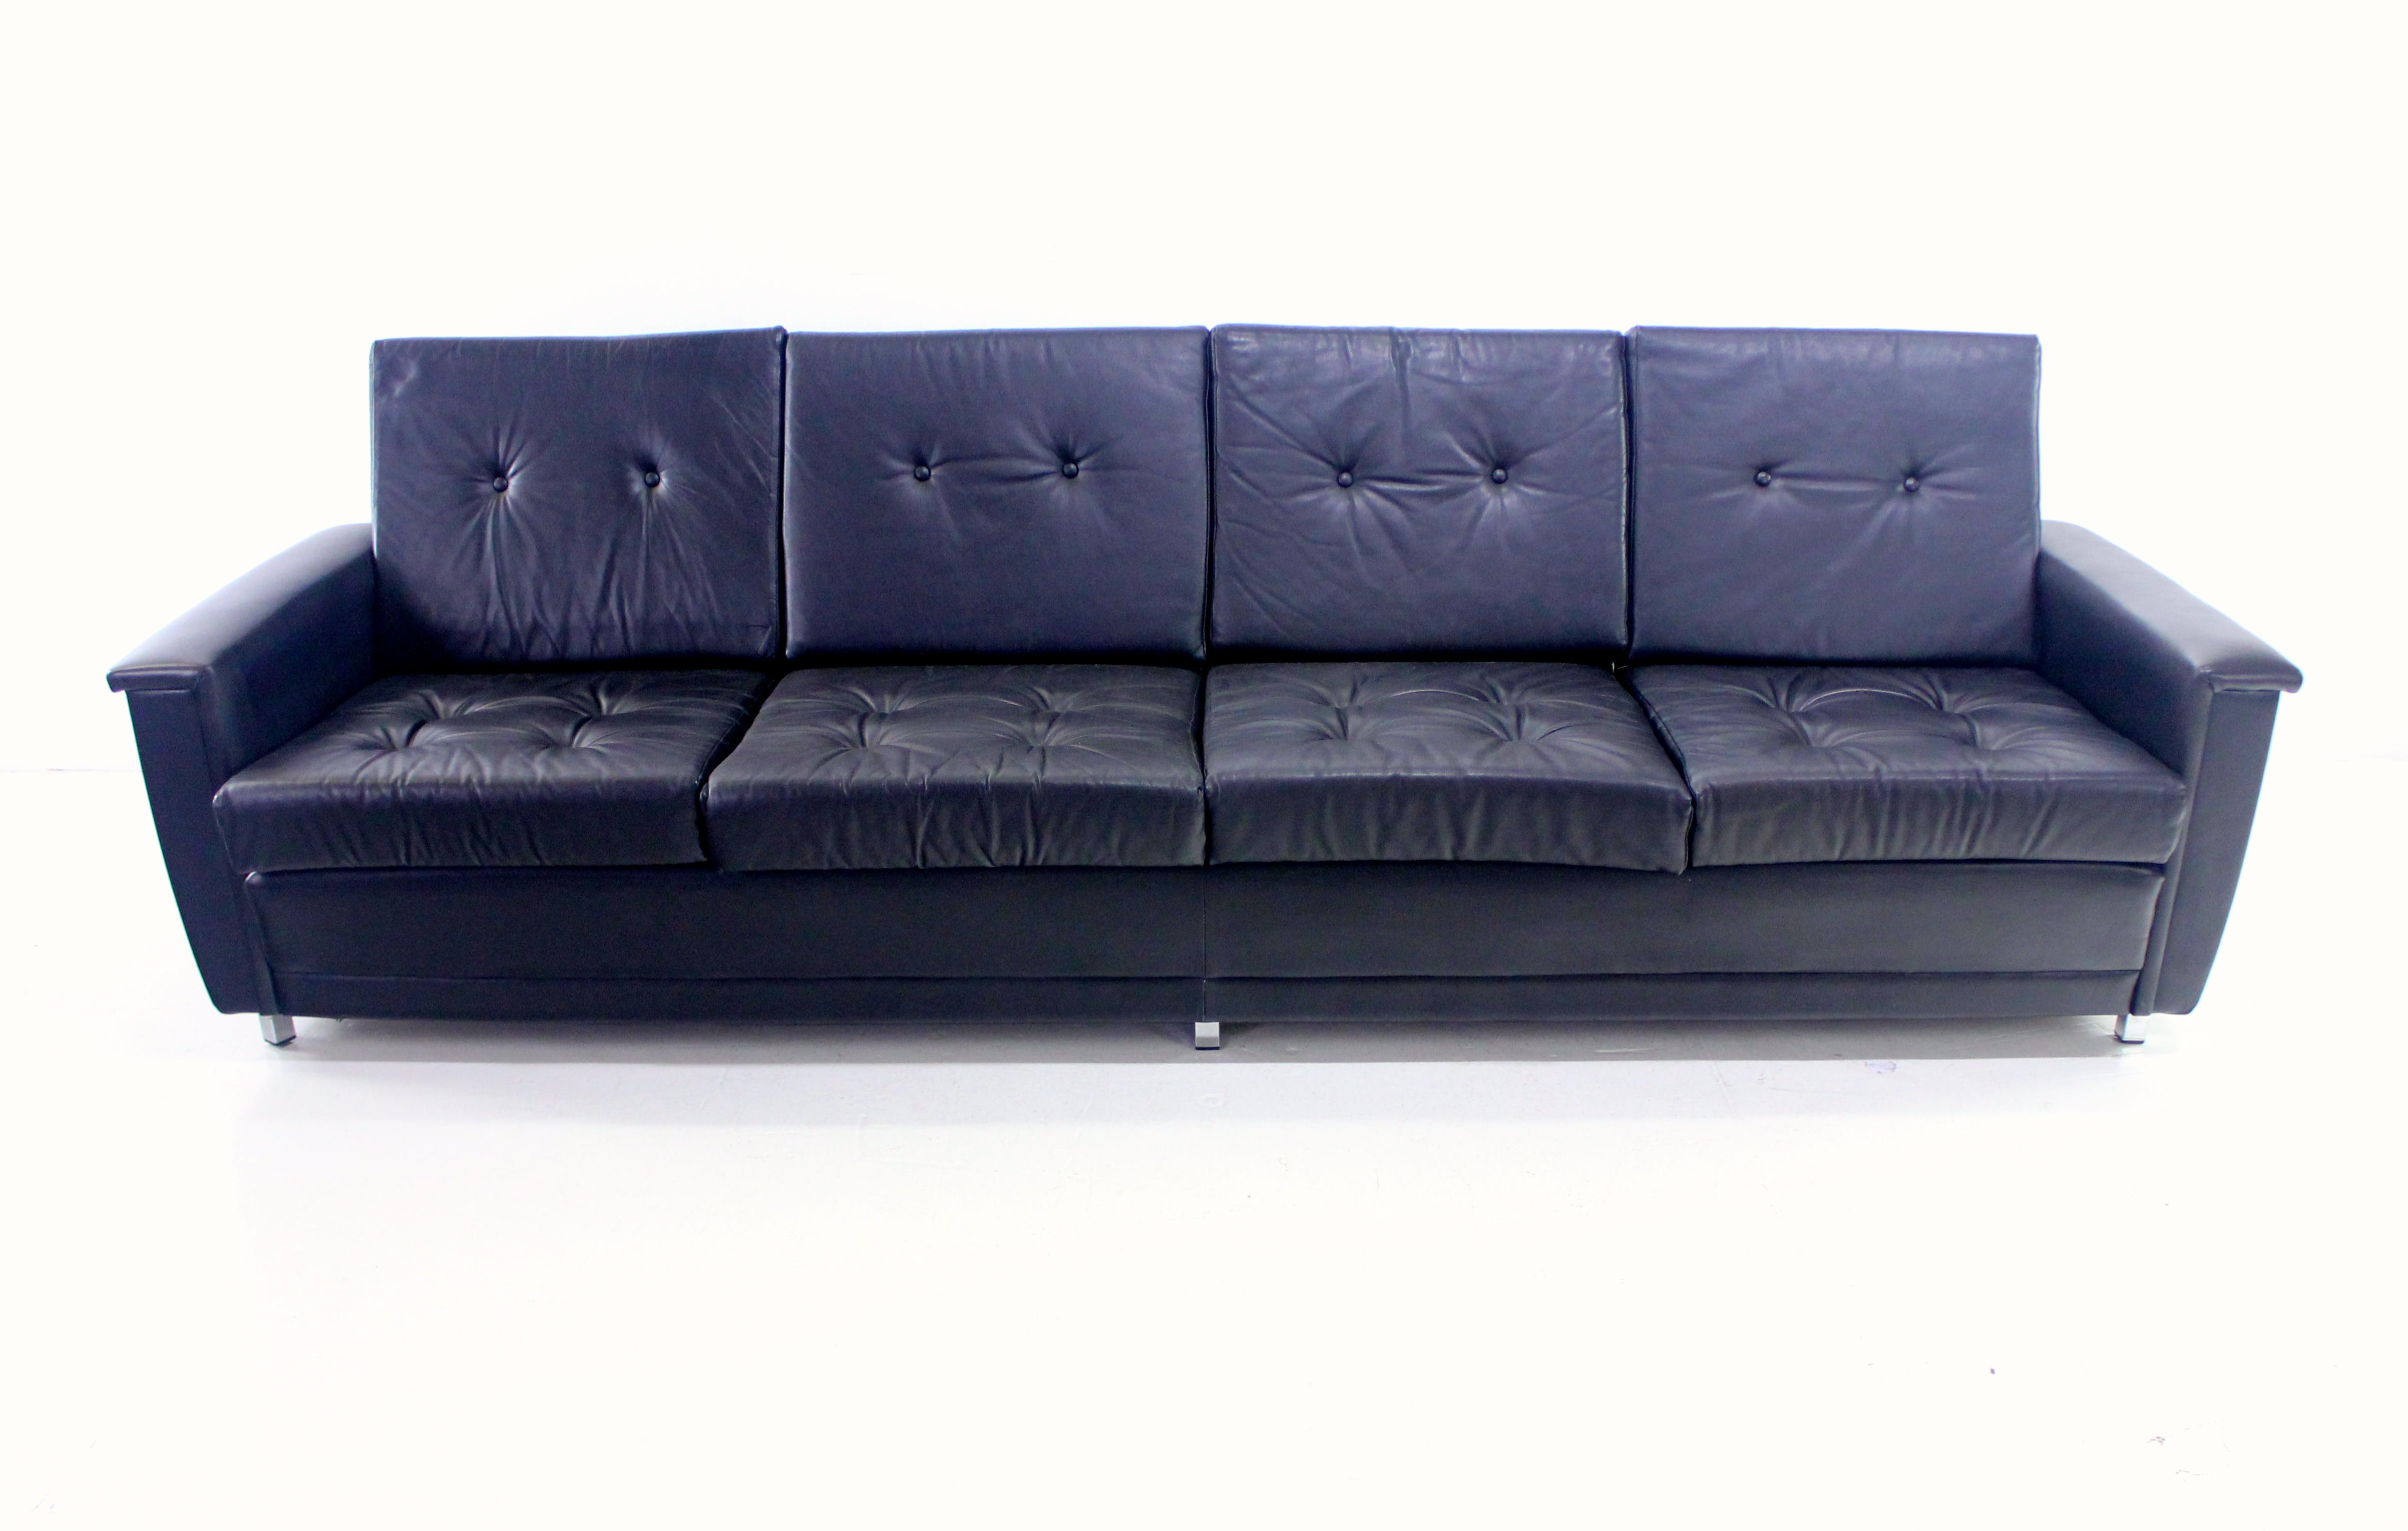 exceptional danish modern black leather sofa lookmodern